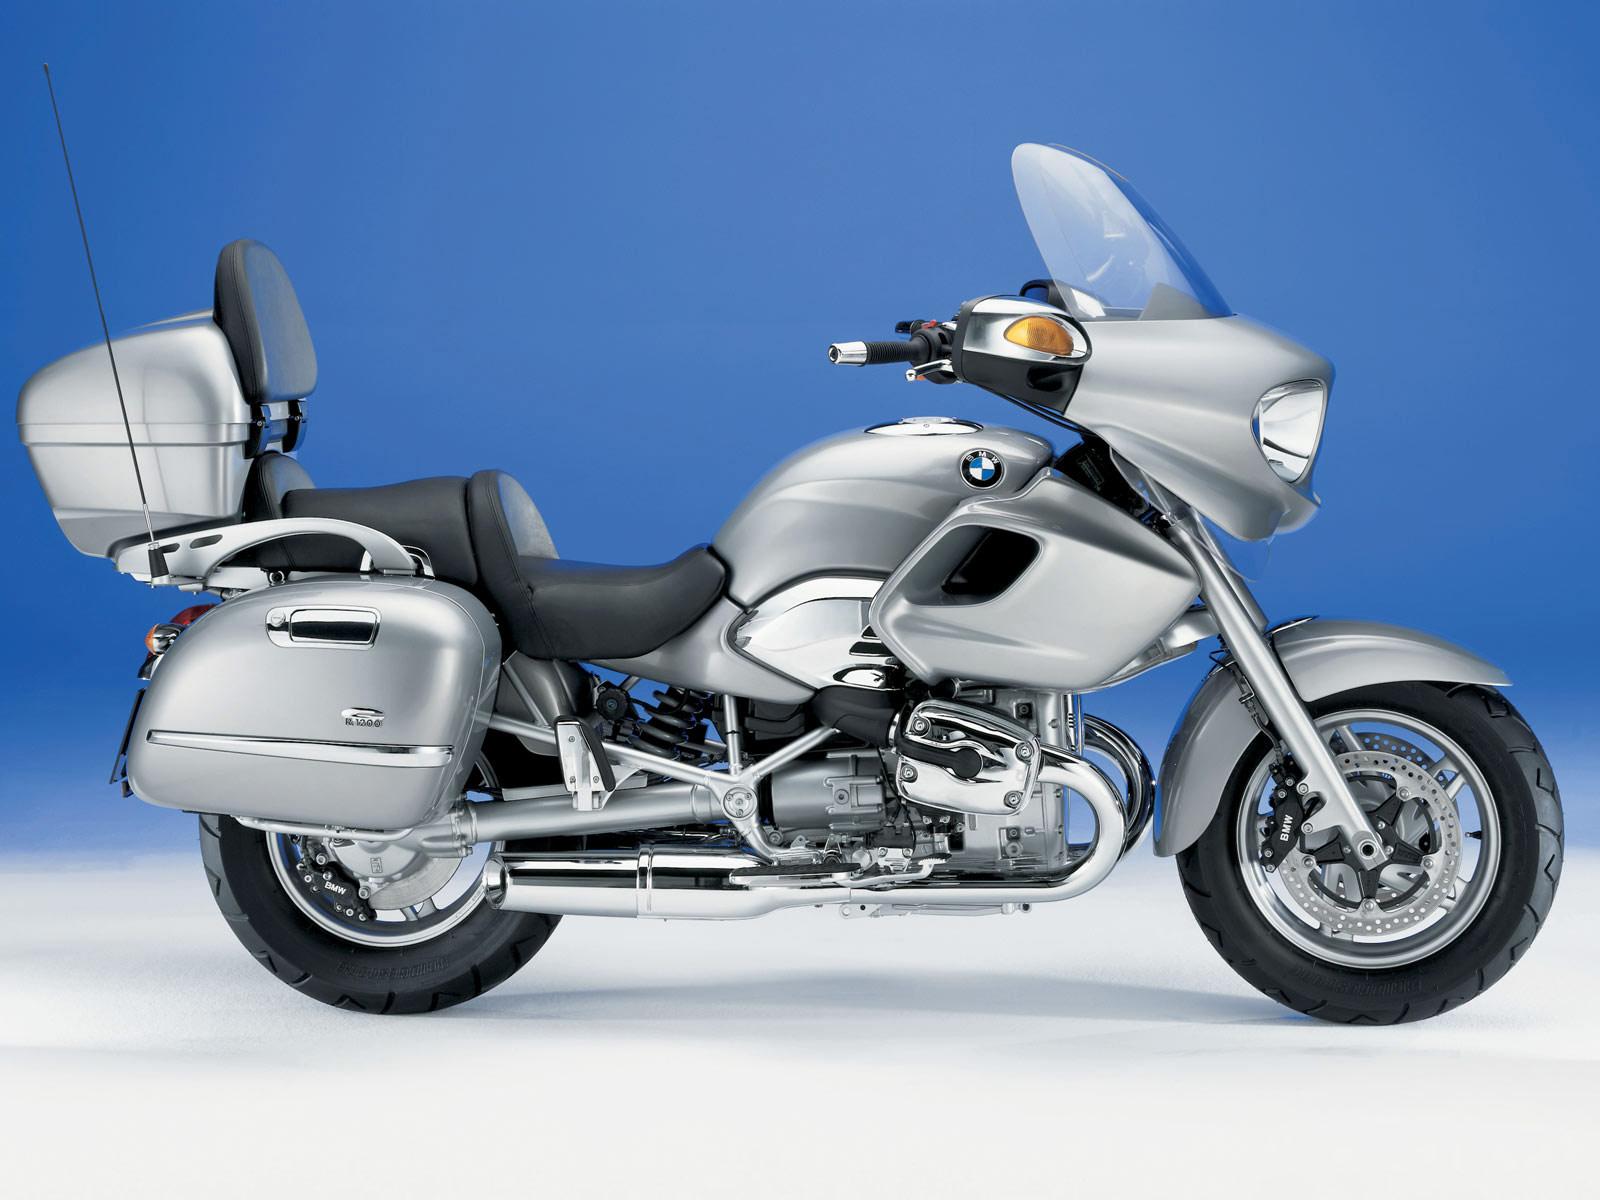 Motorcycle desktop wallpaper dealer lawyer insurance specs 1600x1200